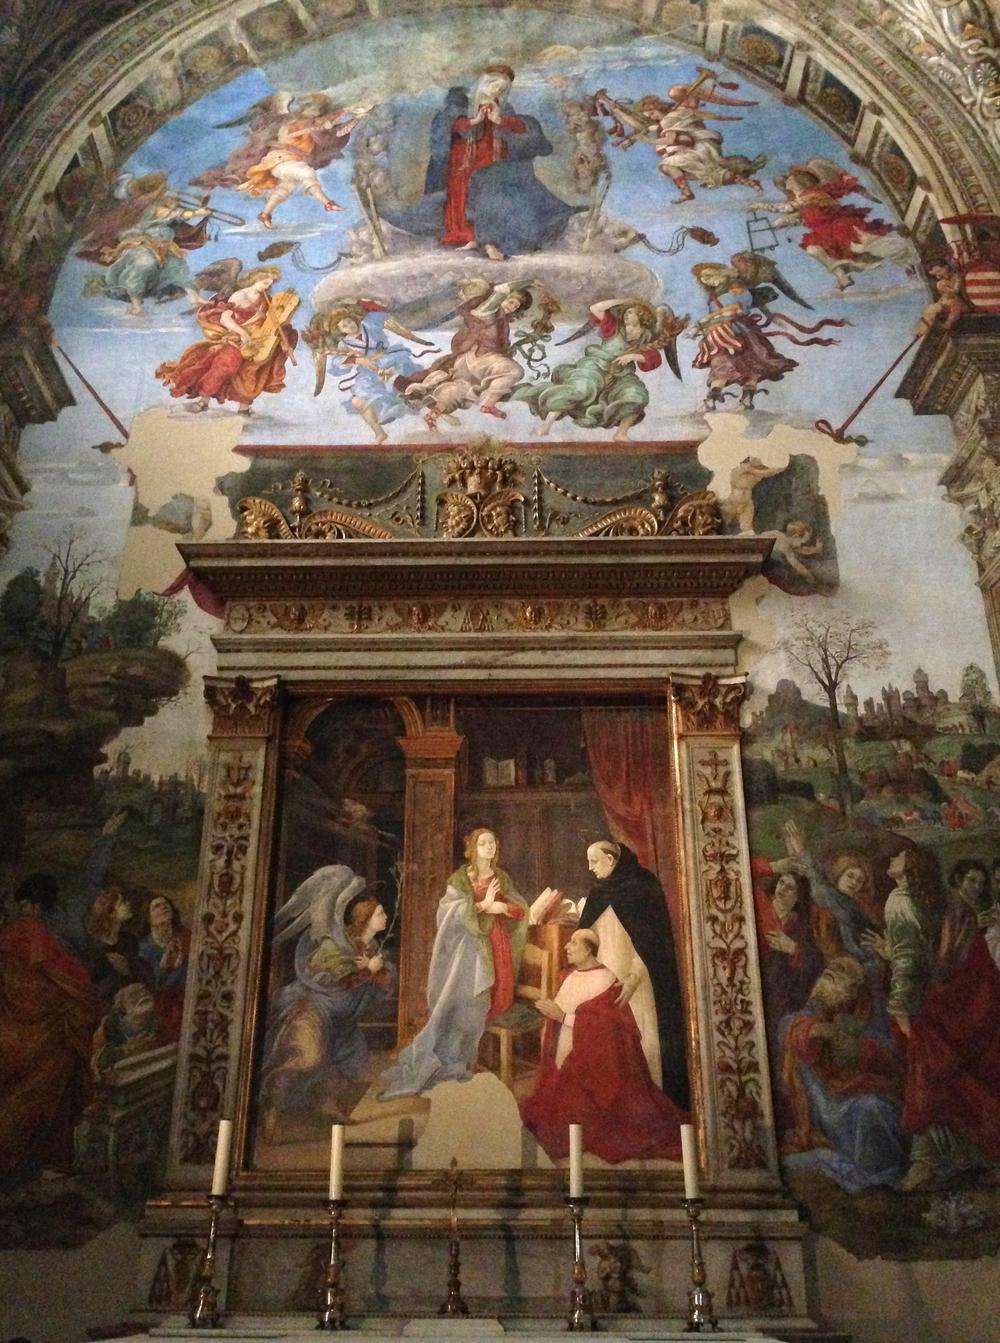 The annunciation by Fra Fillippino Lippi in Carafa Chapel in the church of Santa Maria sopra Minerva, Rome, Italy